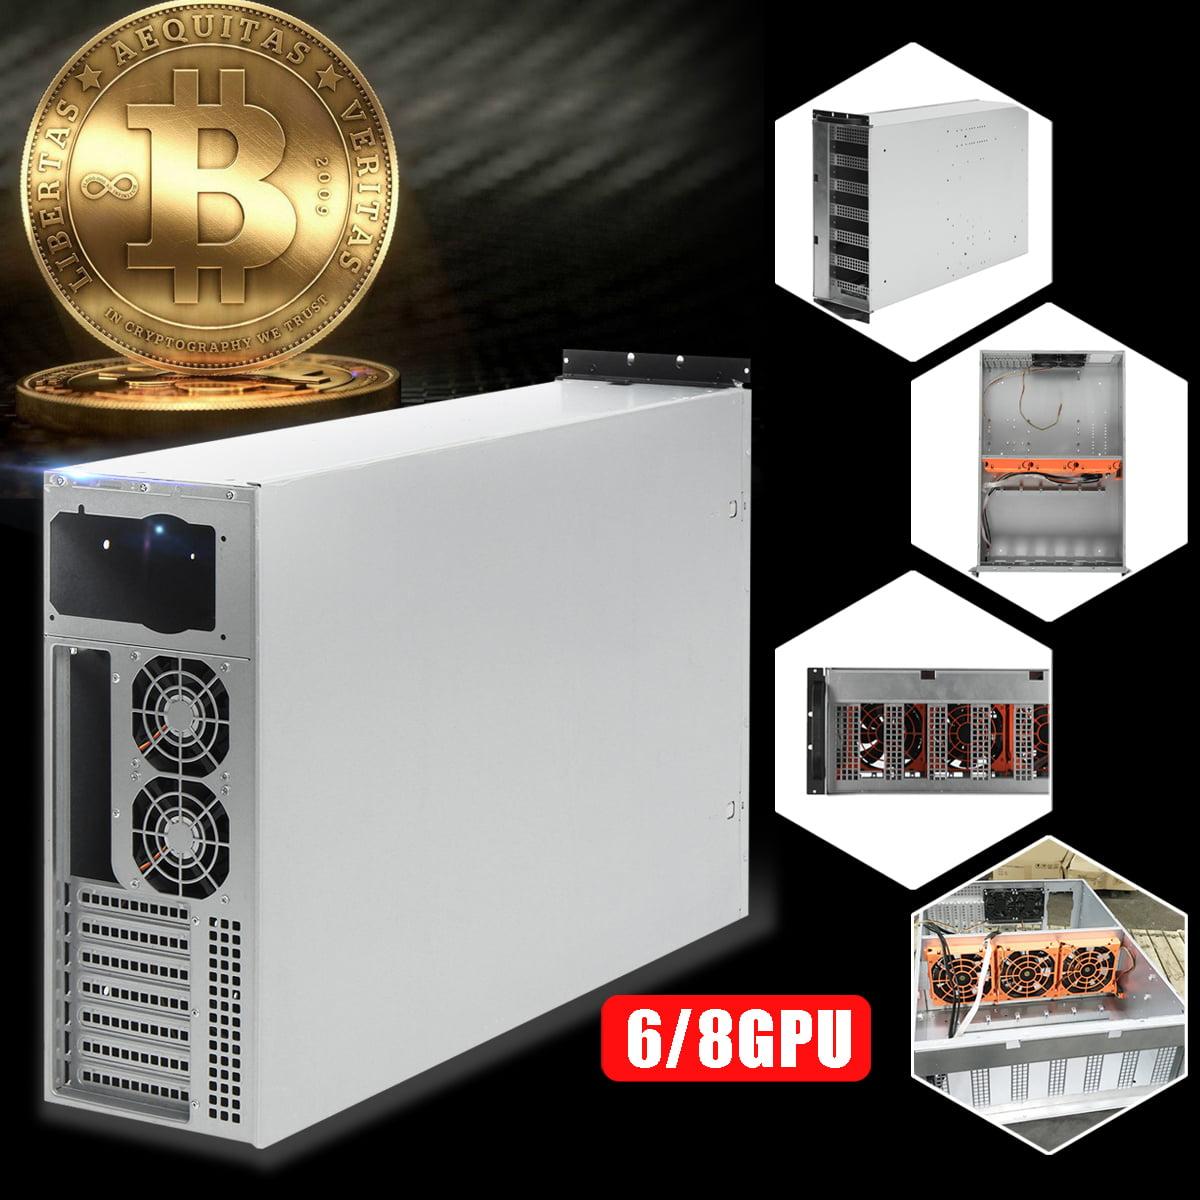 6/8 GPU 4U Miner Mining Rig bitcoinminingmachine Case Machine Coin Open Air Frame For Bitcoin Support 5 Fans